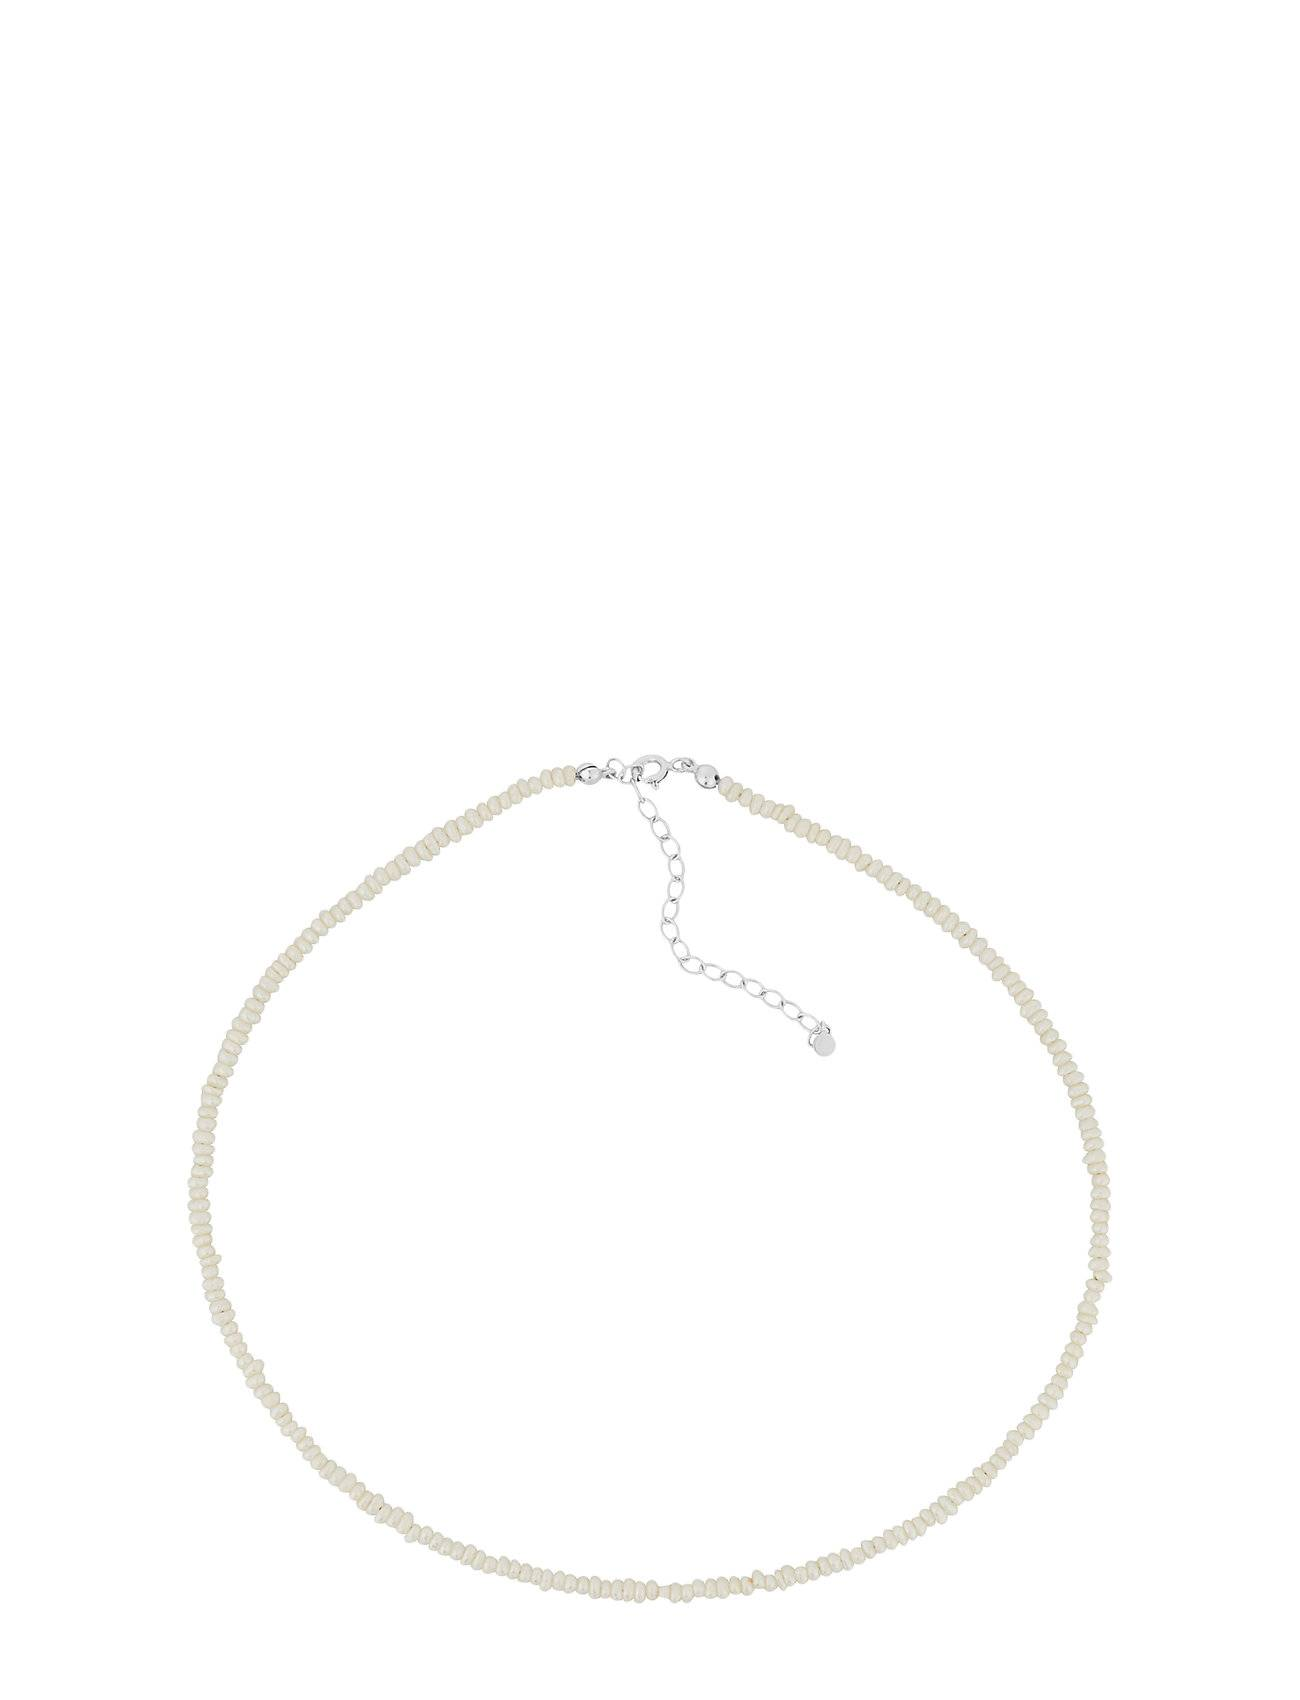 Pernille Corydon Baroque Pearl Necklace Adj. 38-44 Cm Accessories Jewellery Necklaces Dainty Necklaces Hopea Pernille Corydon